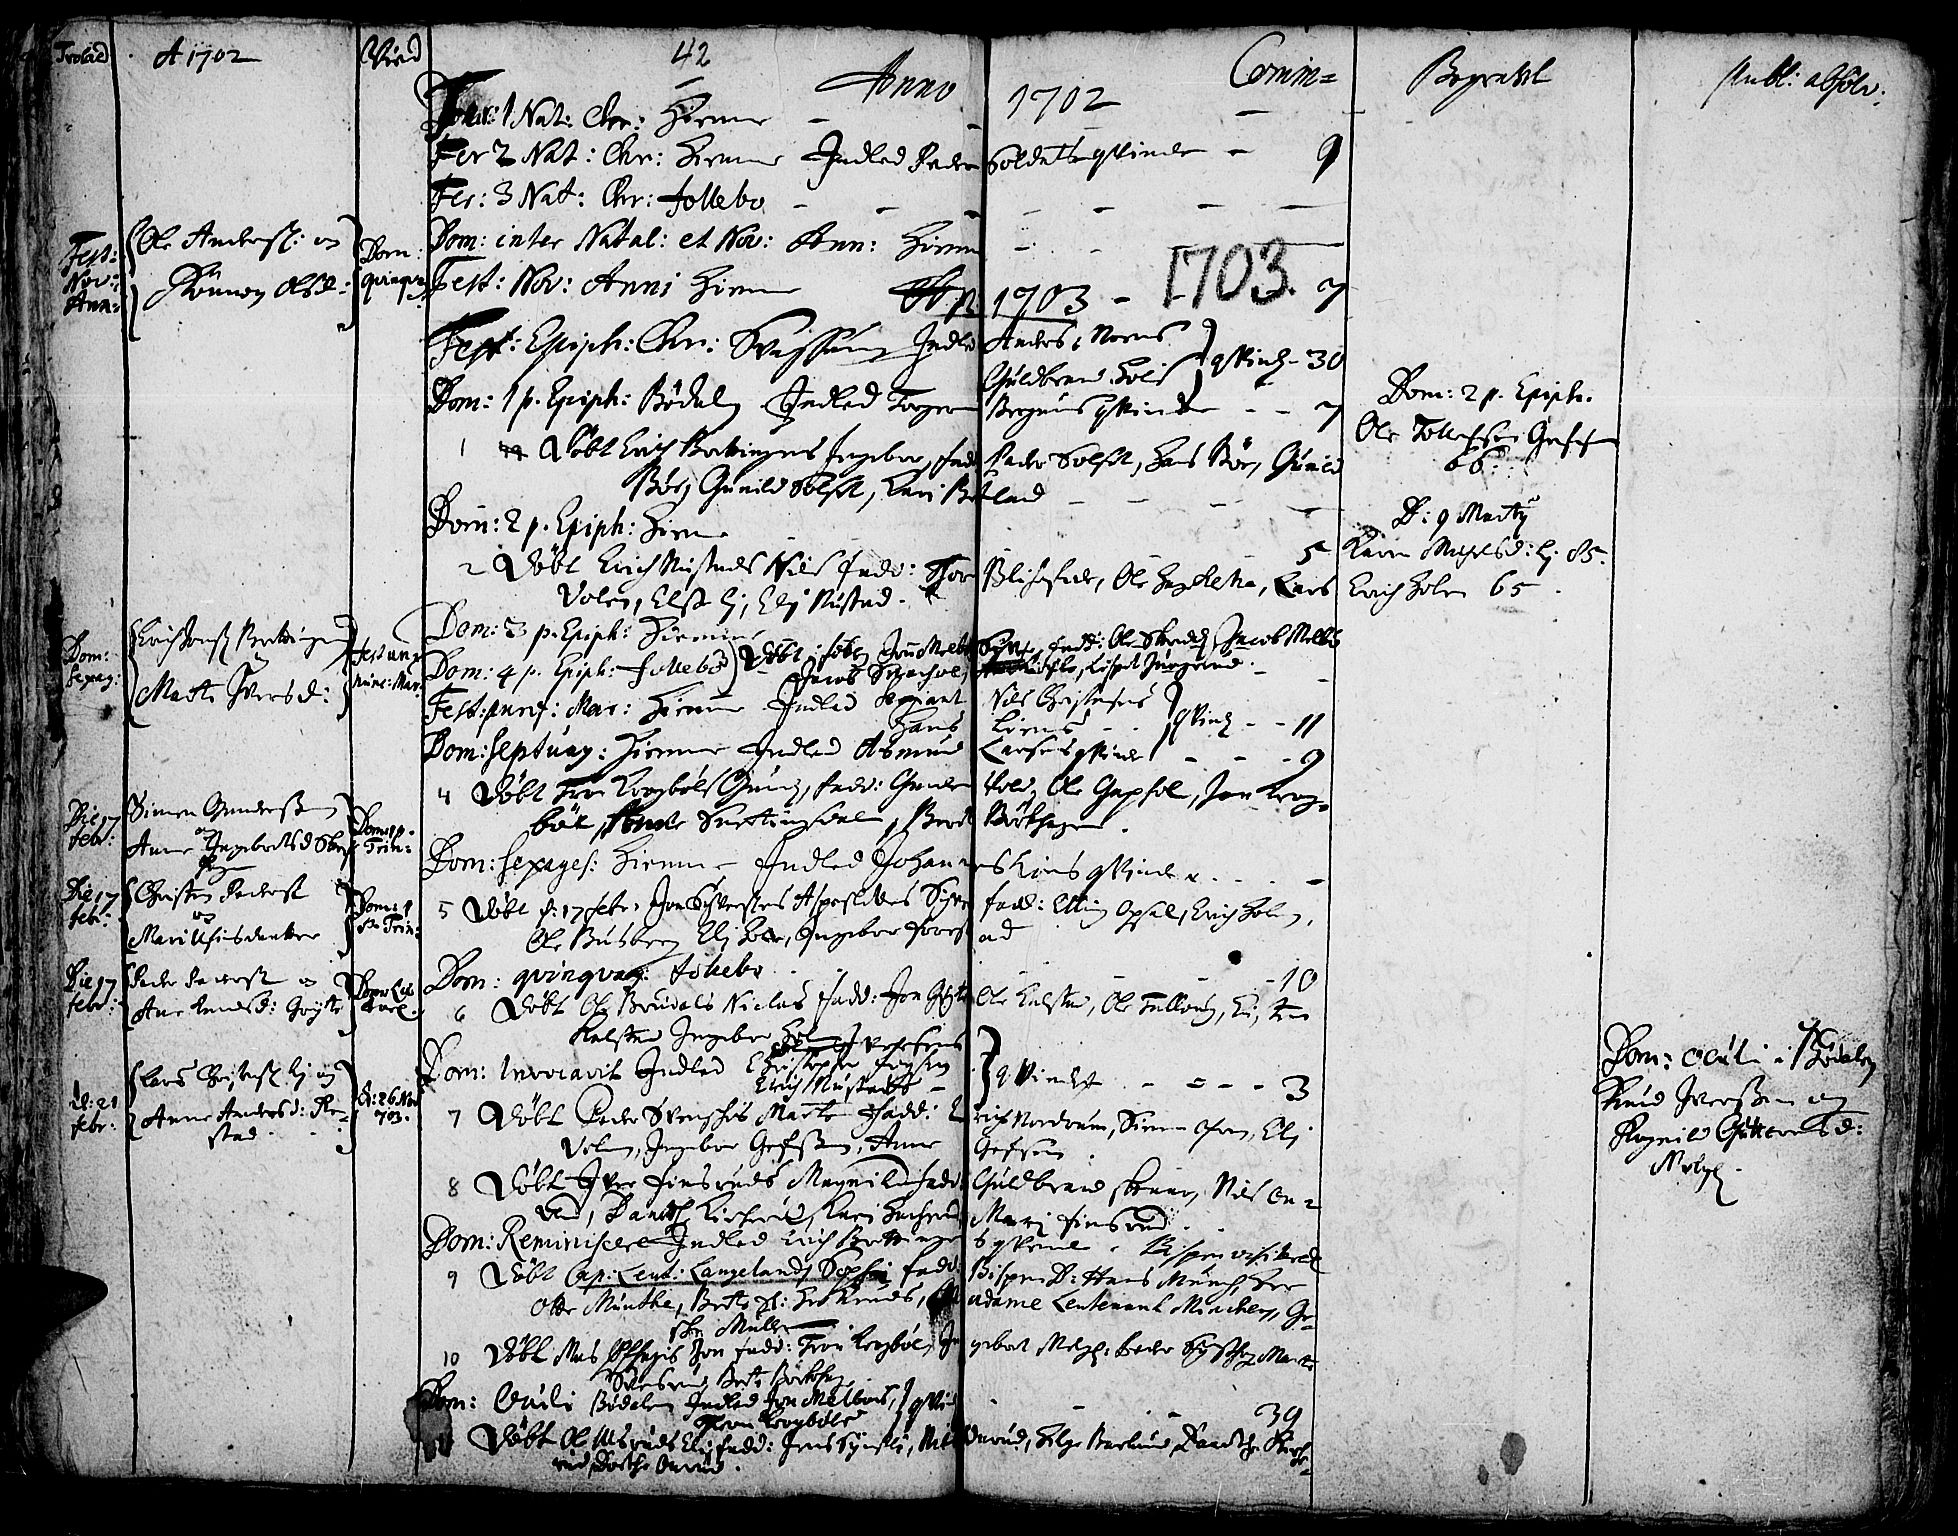 SAH, Gausdal prestekontor, Ministerialbok nr. 1, 1693-1728, s. 42